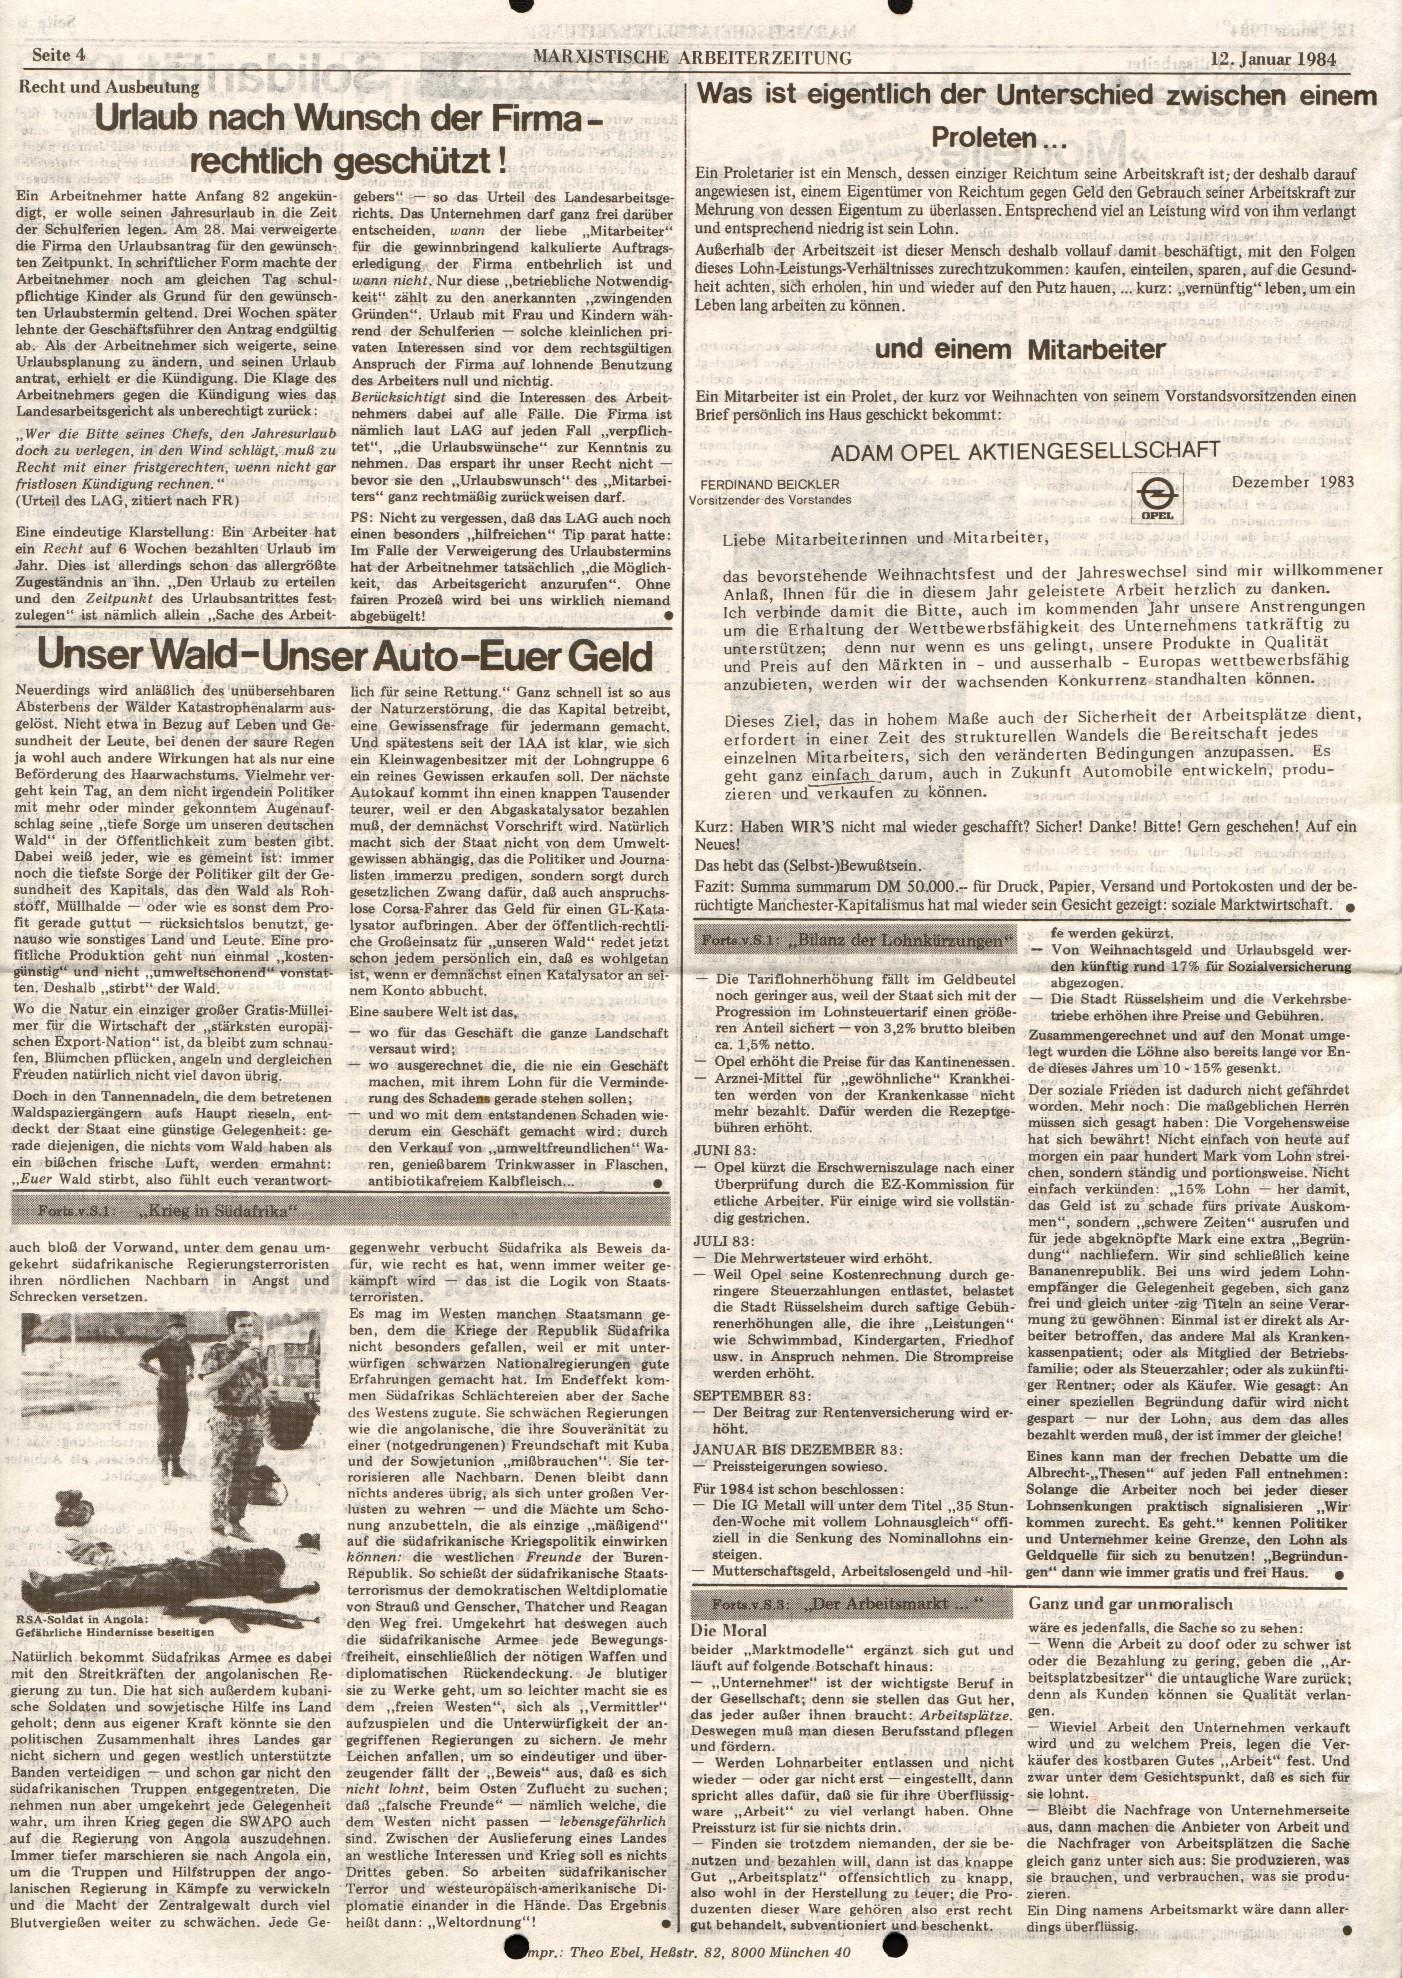 Ruesselsheim_MG_Marxistische_Arbeiterzeitung_Opel_19830112_04